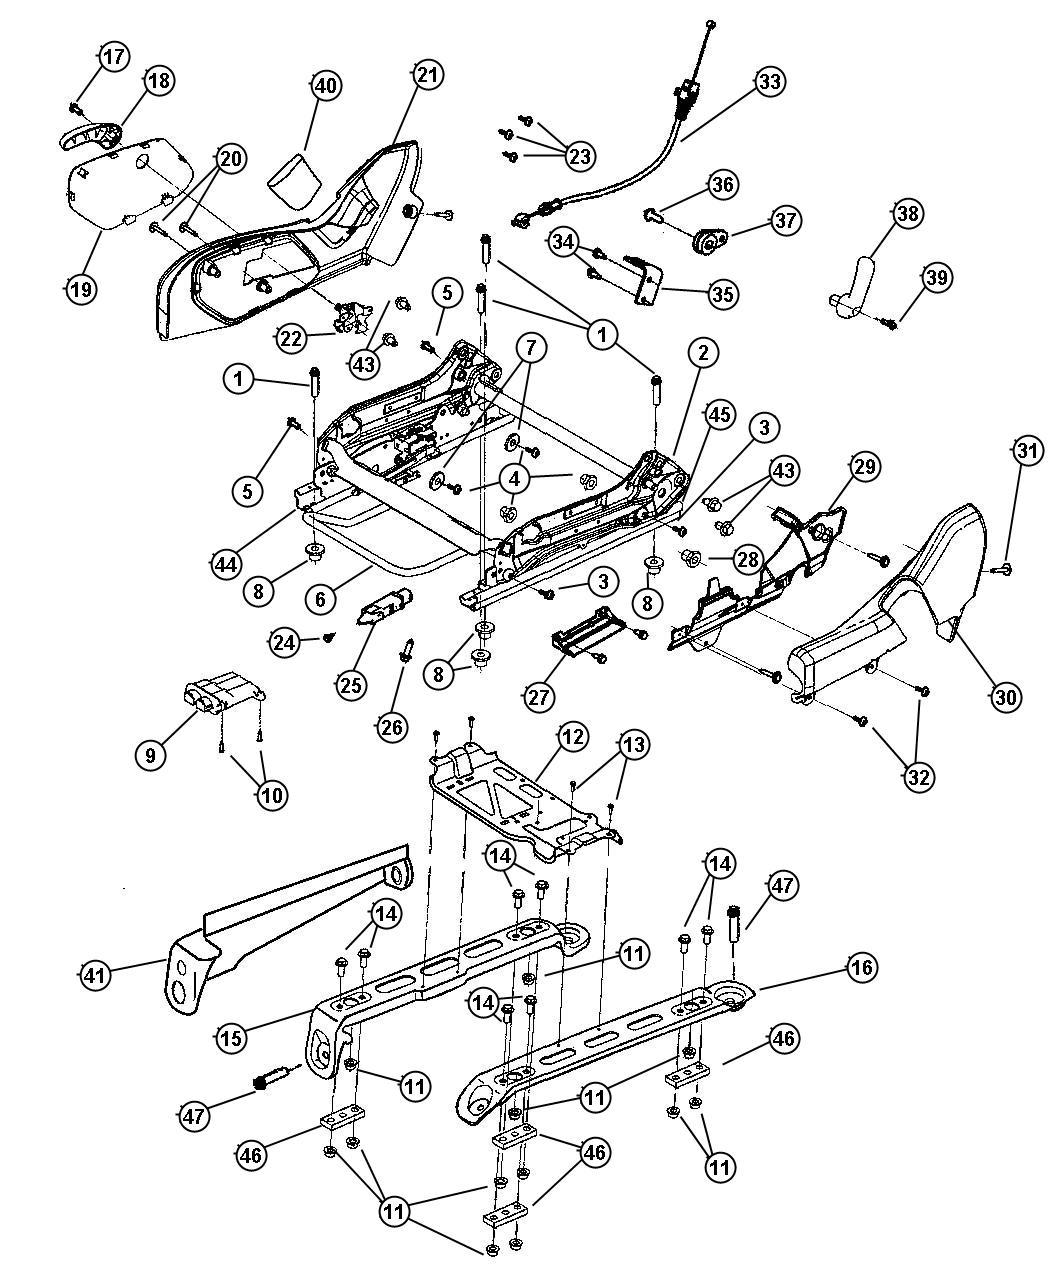 Jeep Grand Cherokee Module Occupant Classification